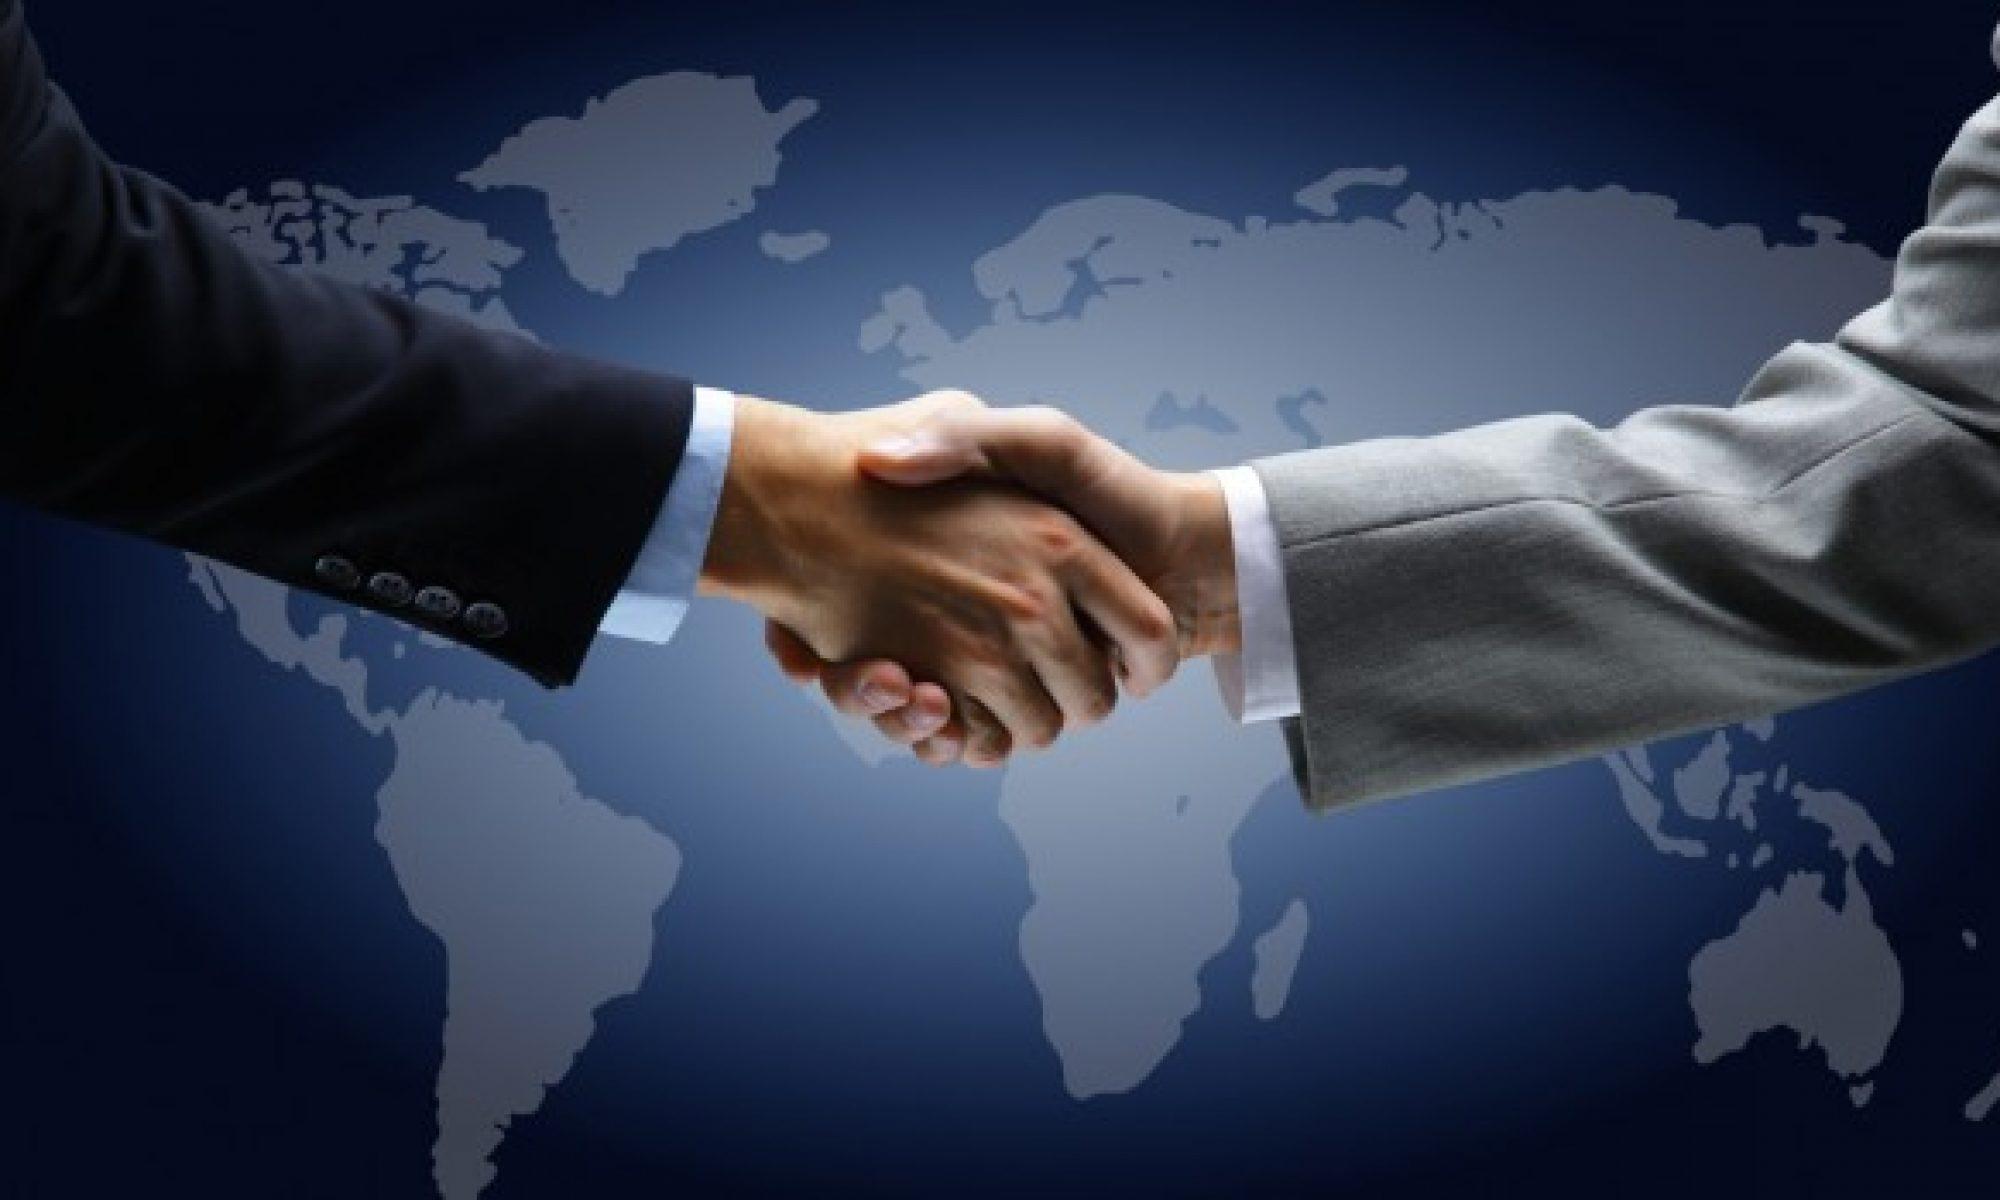 Intersilva Consultancy/Trade/Tourism